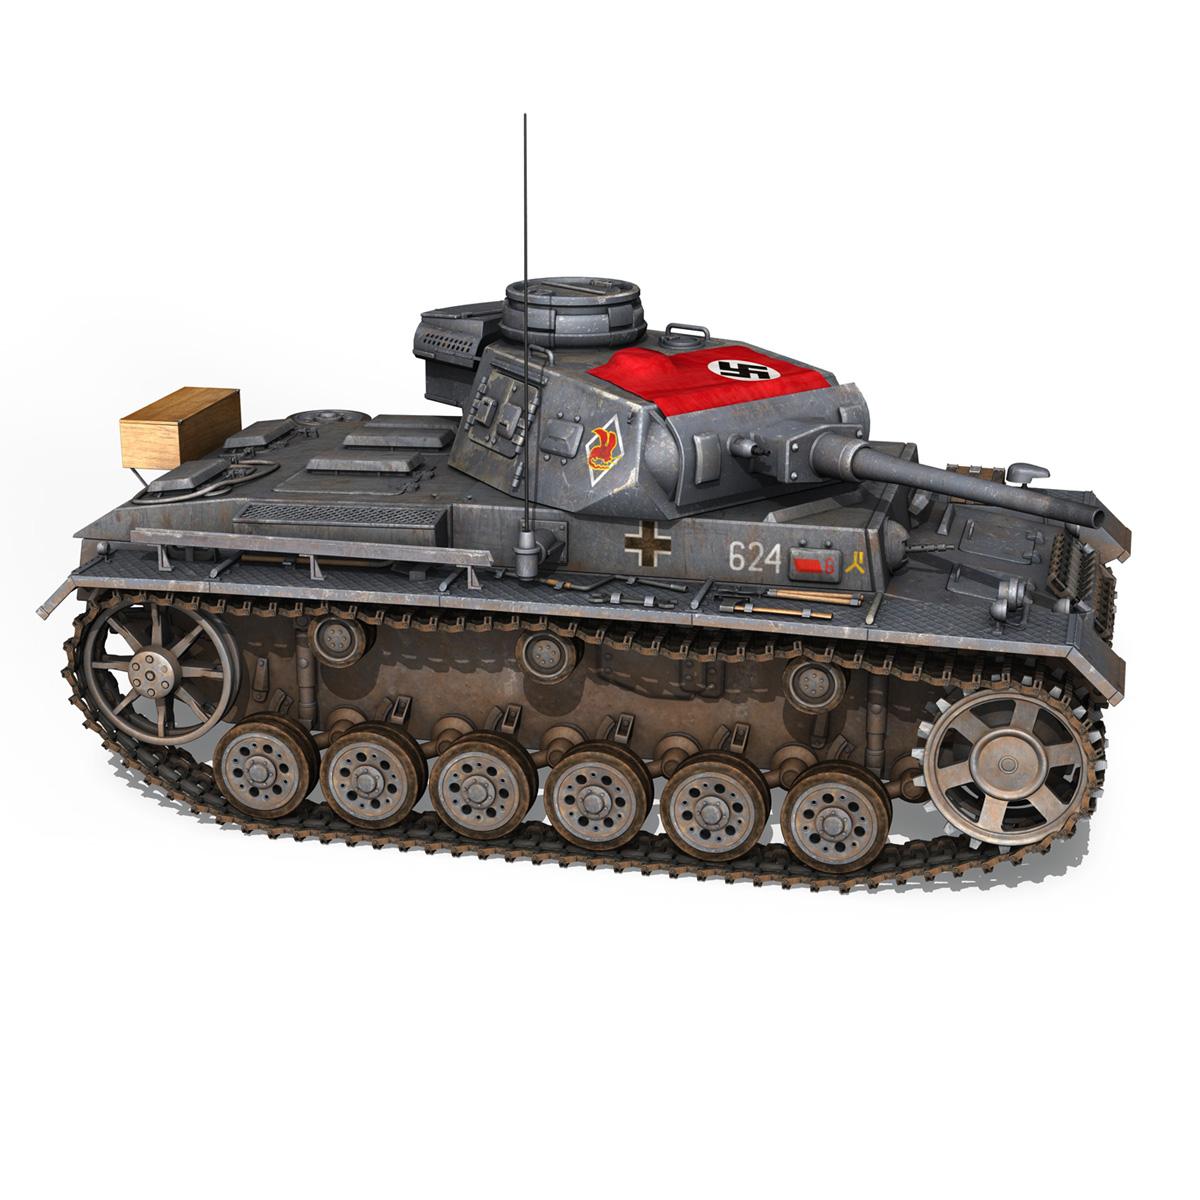 pzkpfw iii – panzer 3 – ausf.j – 624 3d model 3ds fbx lwo lw lws obj c4d 265304